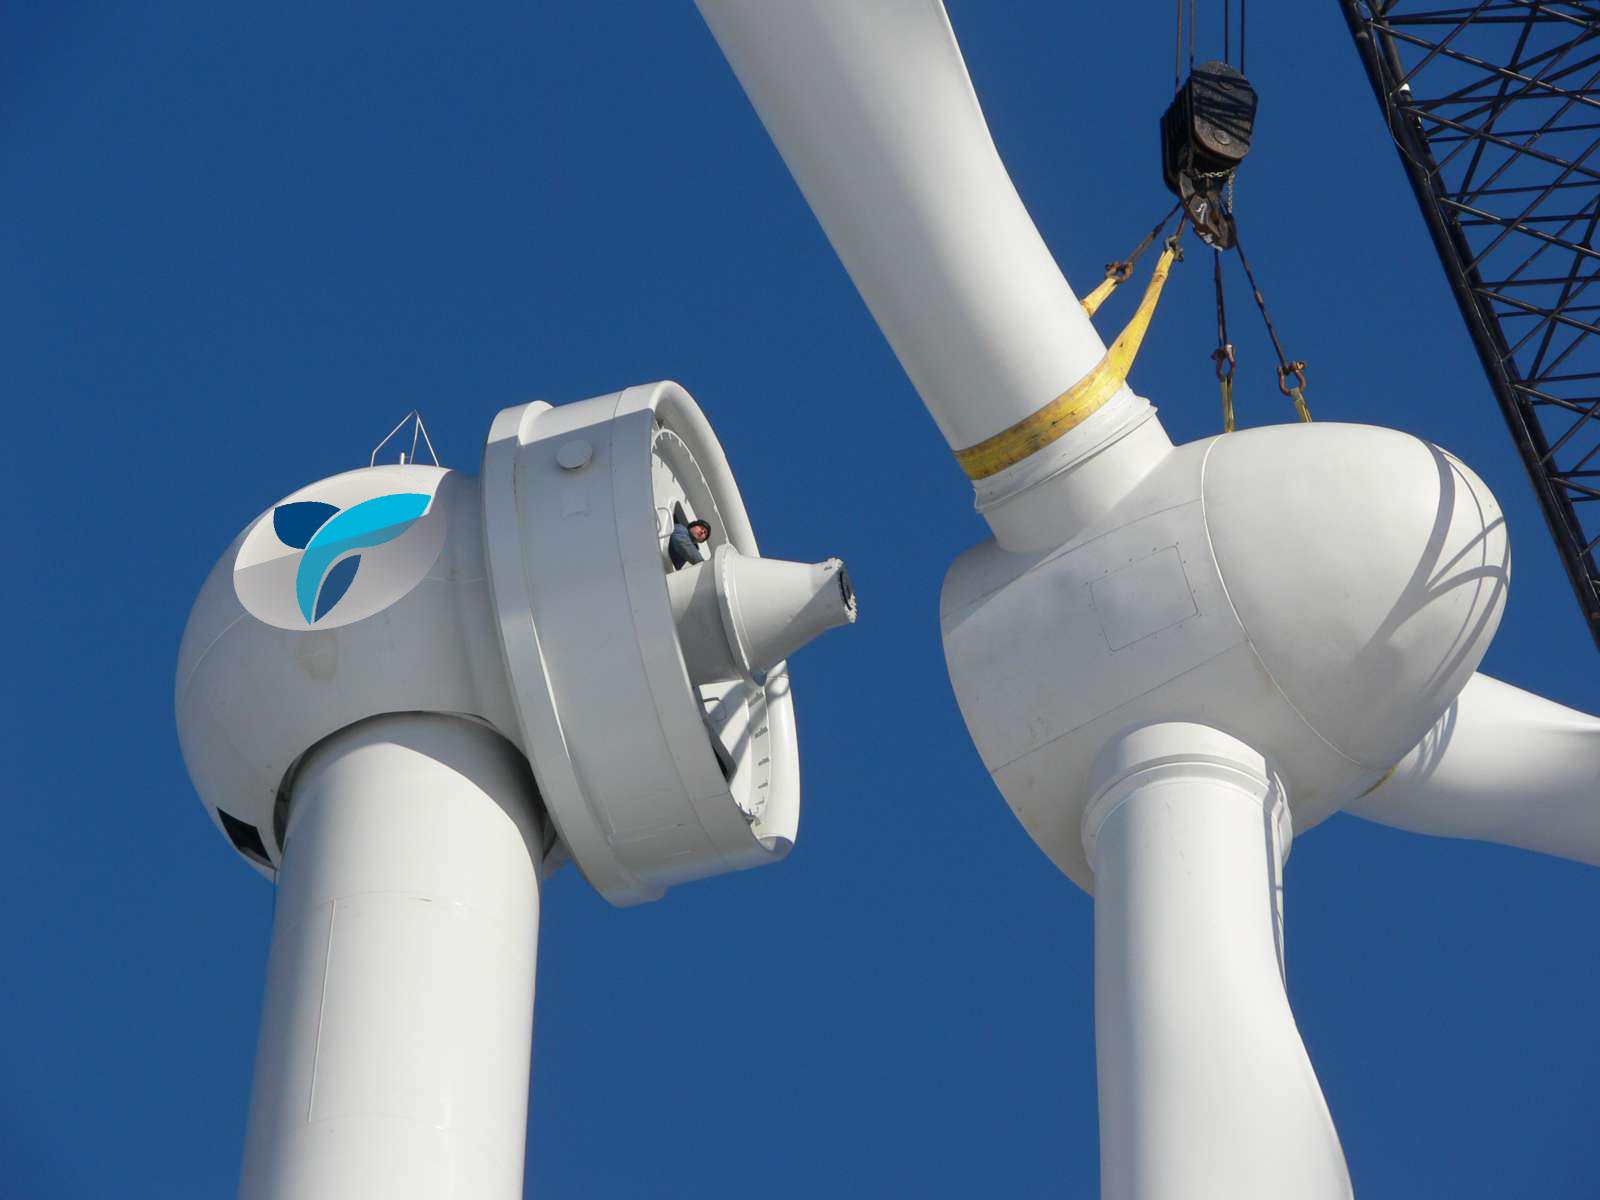 Eólica en América Latina: Crece demanda de palas para aerogeneradores